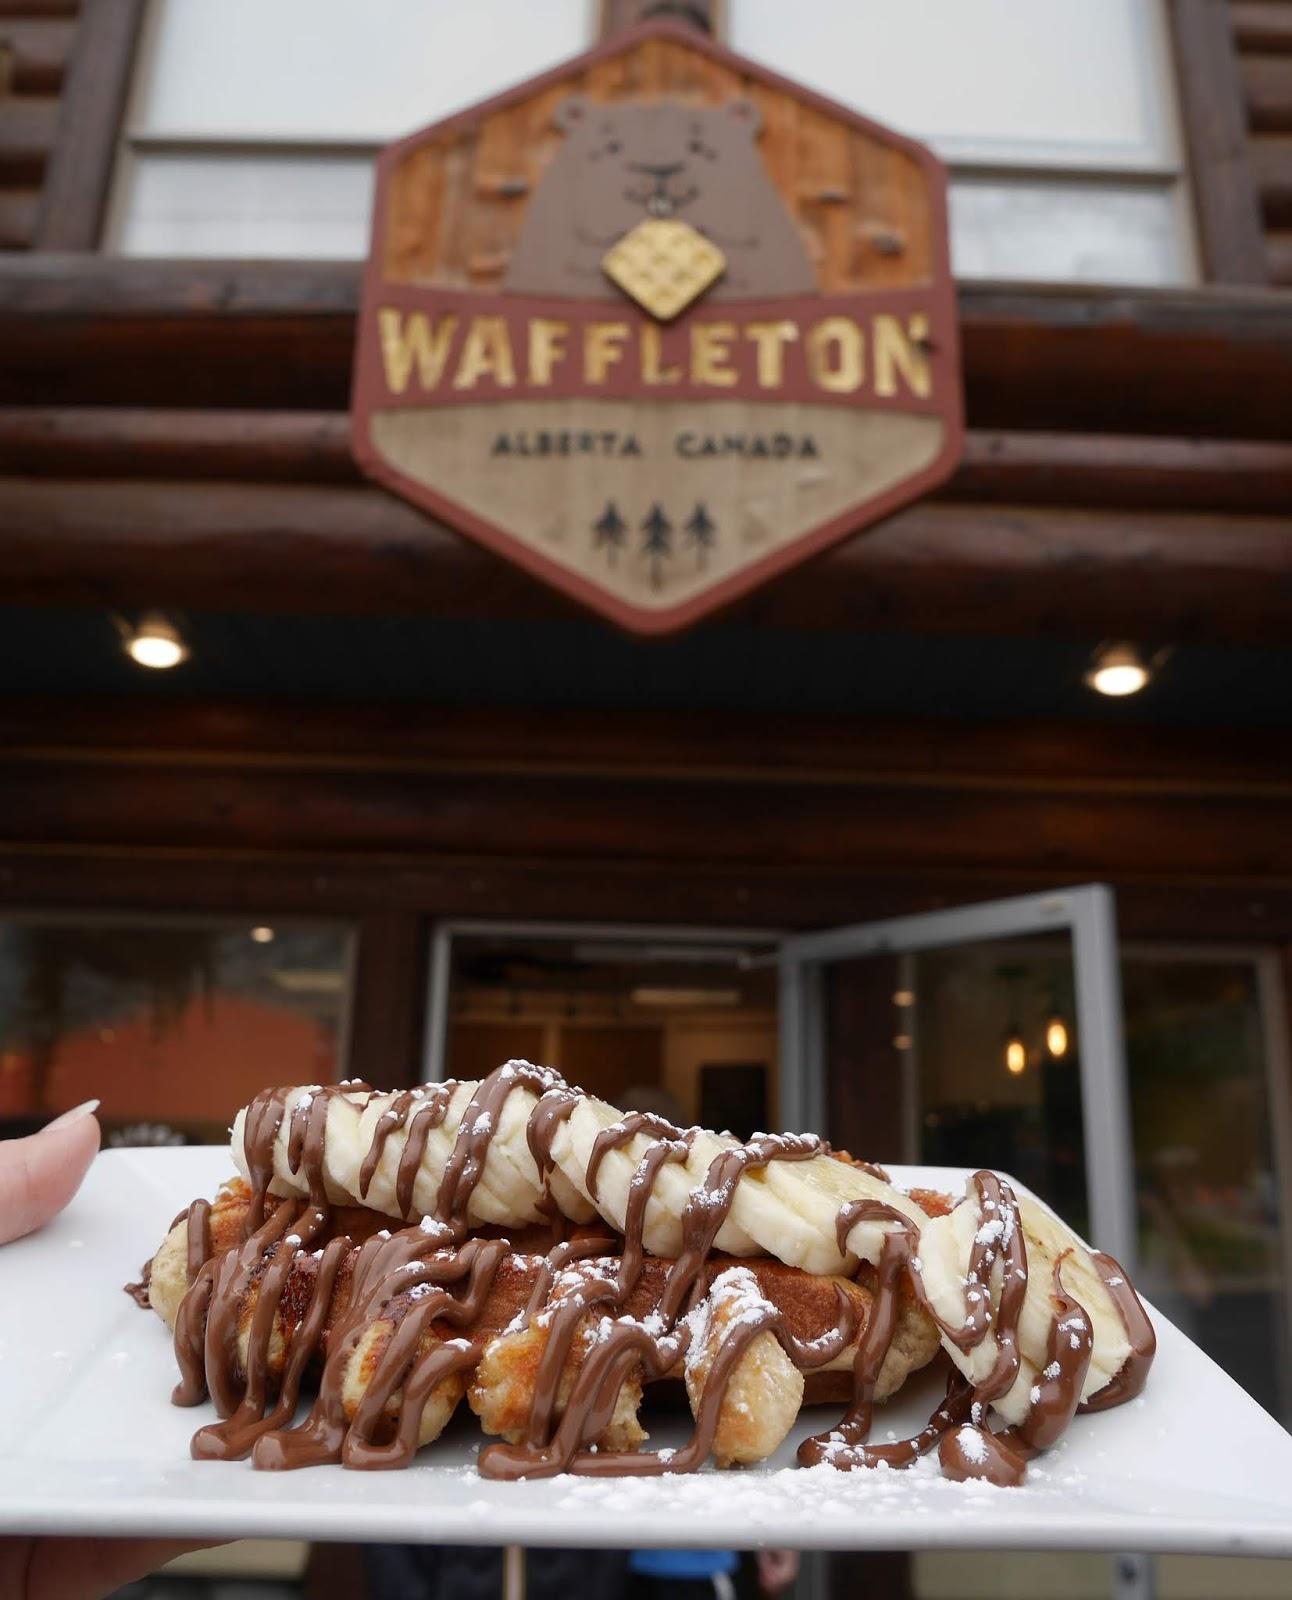 Waffles for breakfast at Waffleton in Waterton Lakes National Park, Alberta